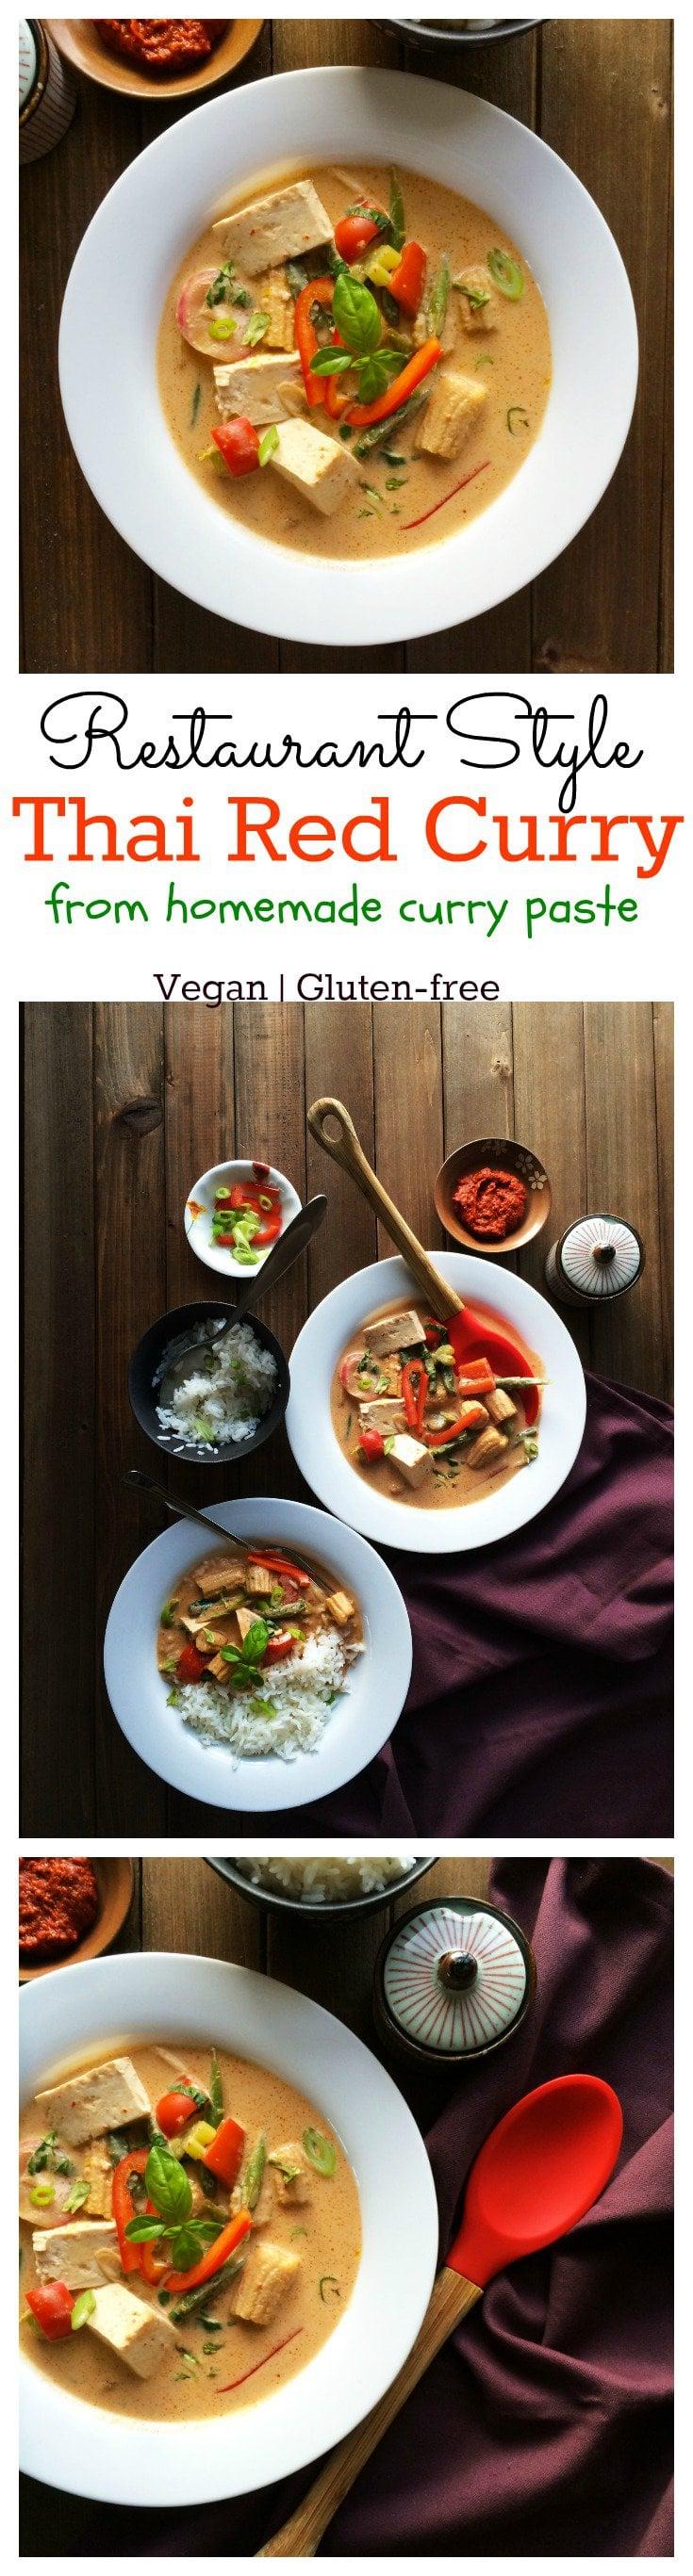 restaurant-style-vegan-thai-red-curry